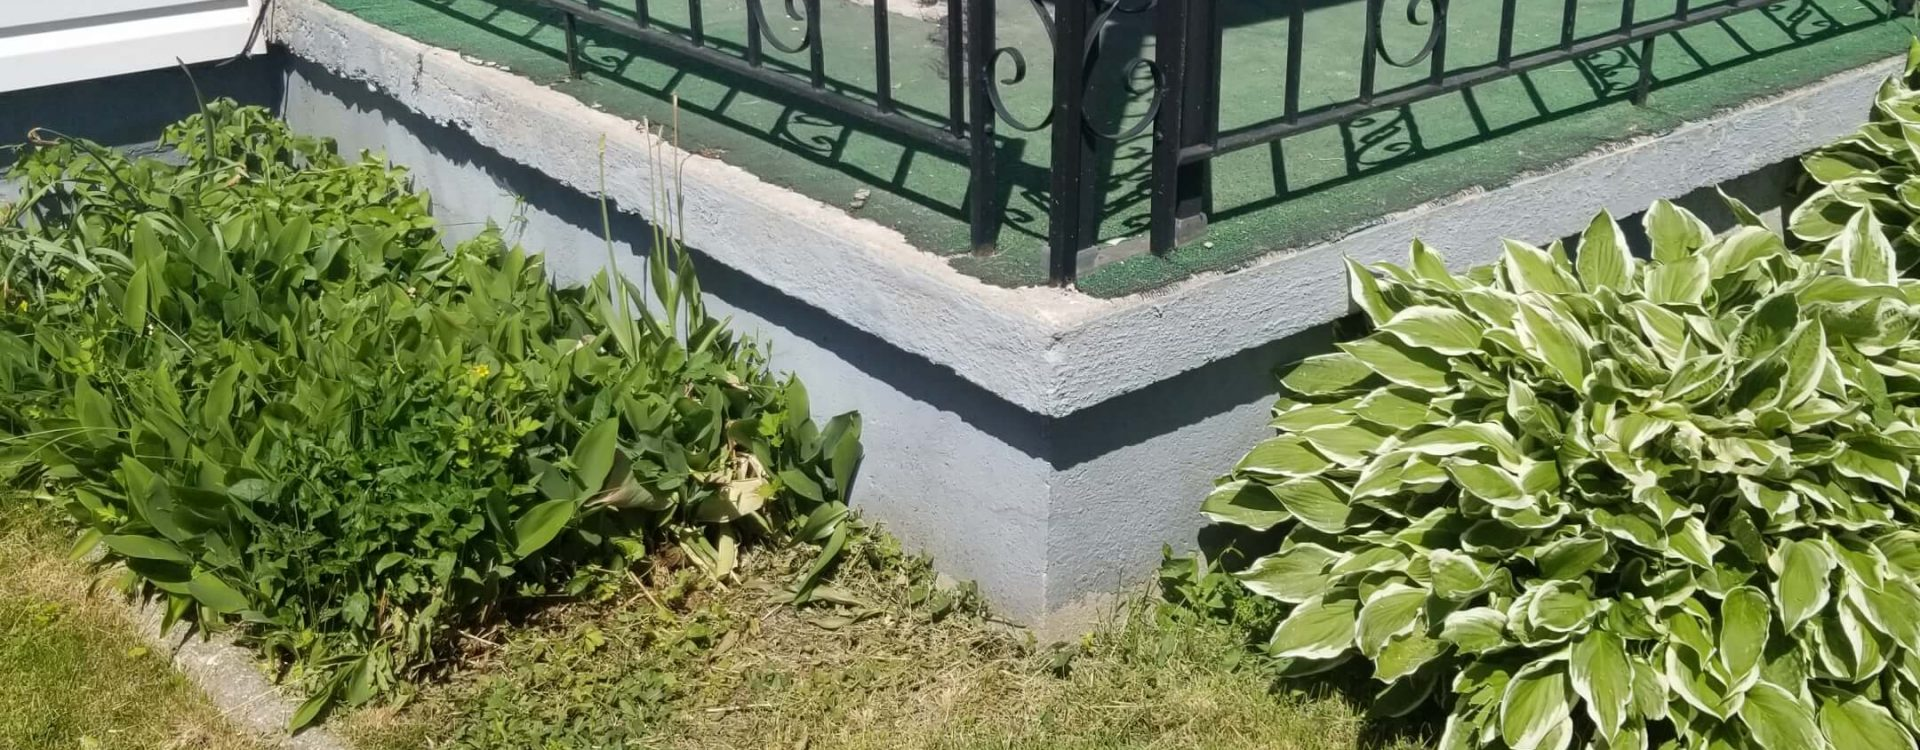 durham masonry restoration before picture